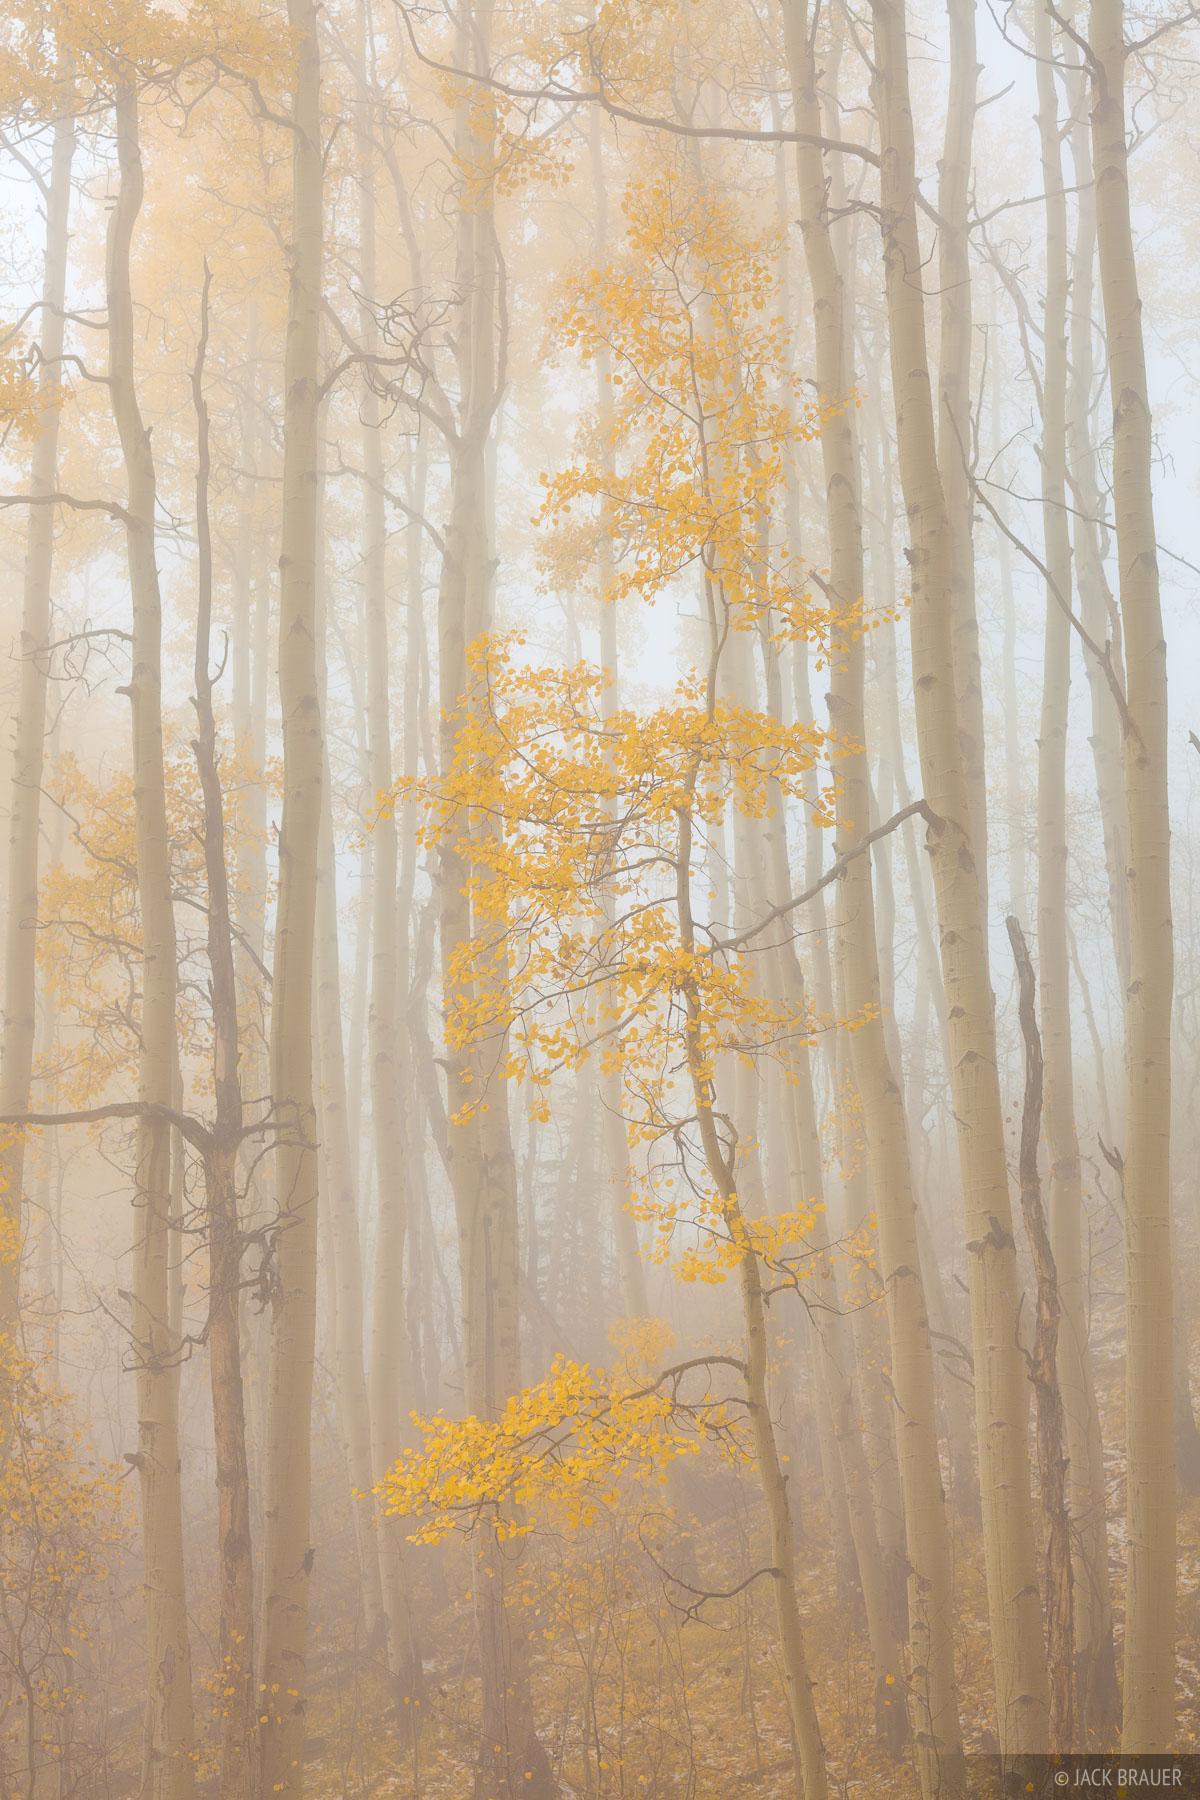 Colorado, San Juan Mountains, autumn, fall, forest, 2012, vertical